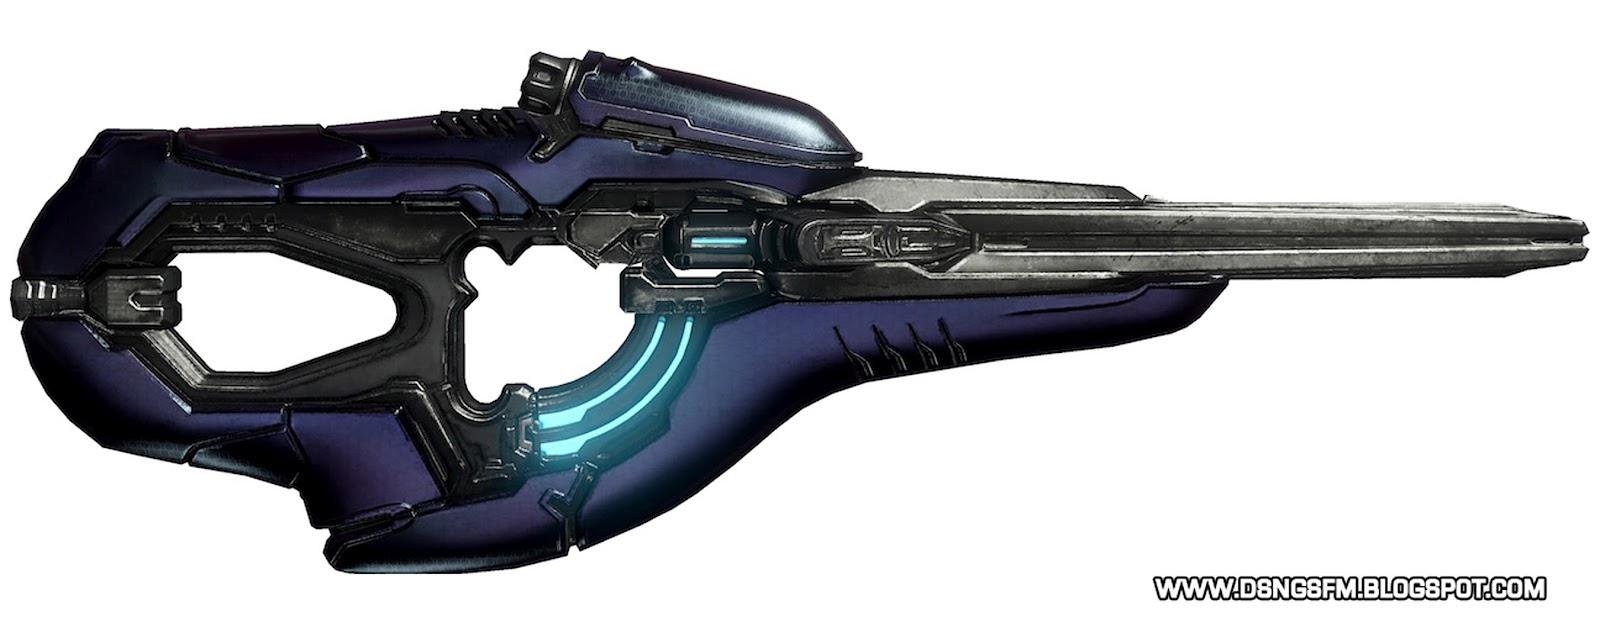 Halo Pixel Energy Sword Art